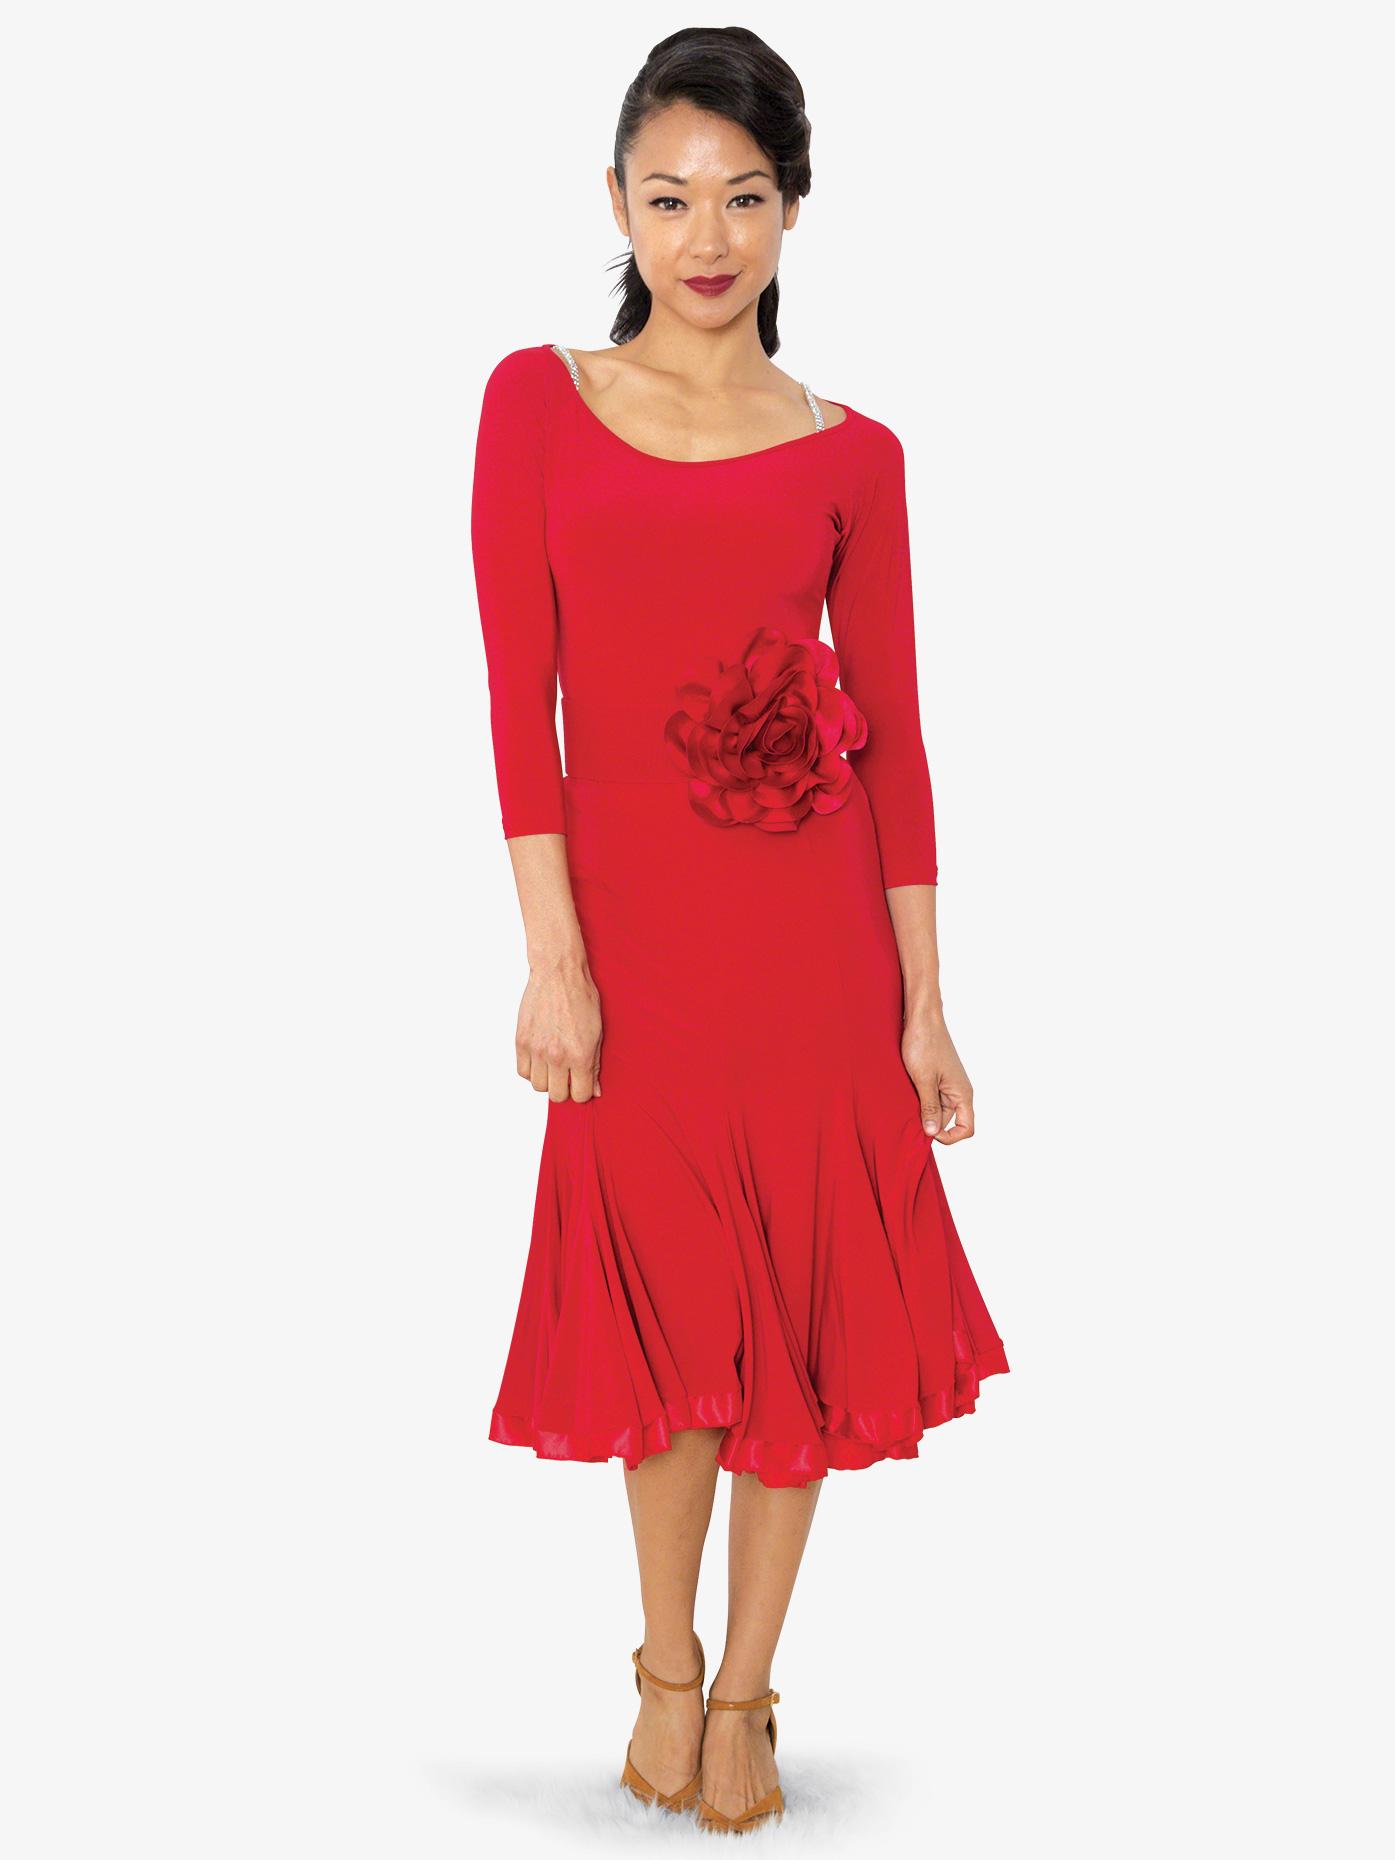 b28ca0bdc36 Womens Mid-Length Banded Ballroom Dance Dance Skirt - Style No S806.  Loading zoom